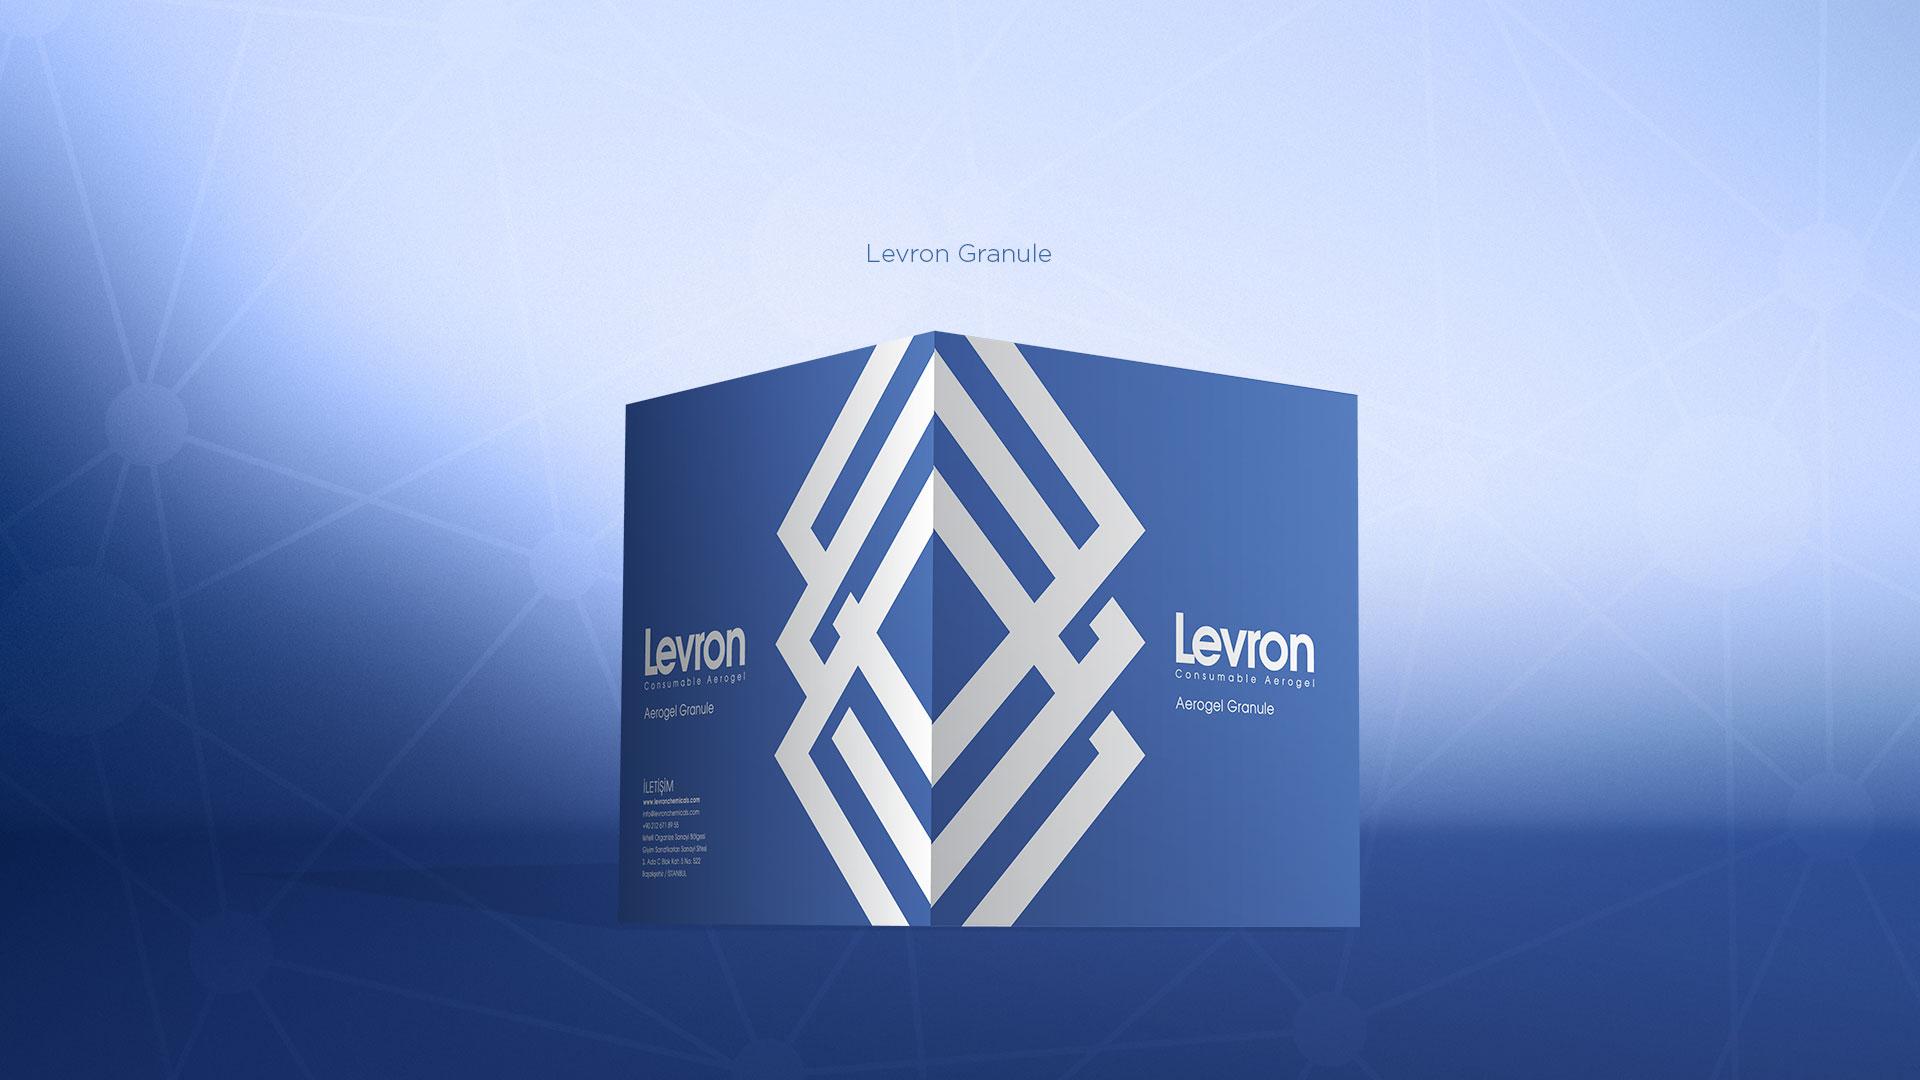 Products - Levron Aerogel Granule   Levron